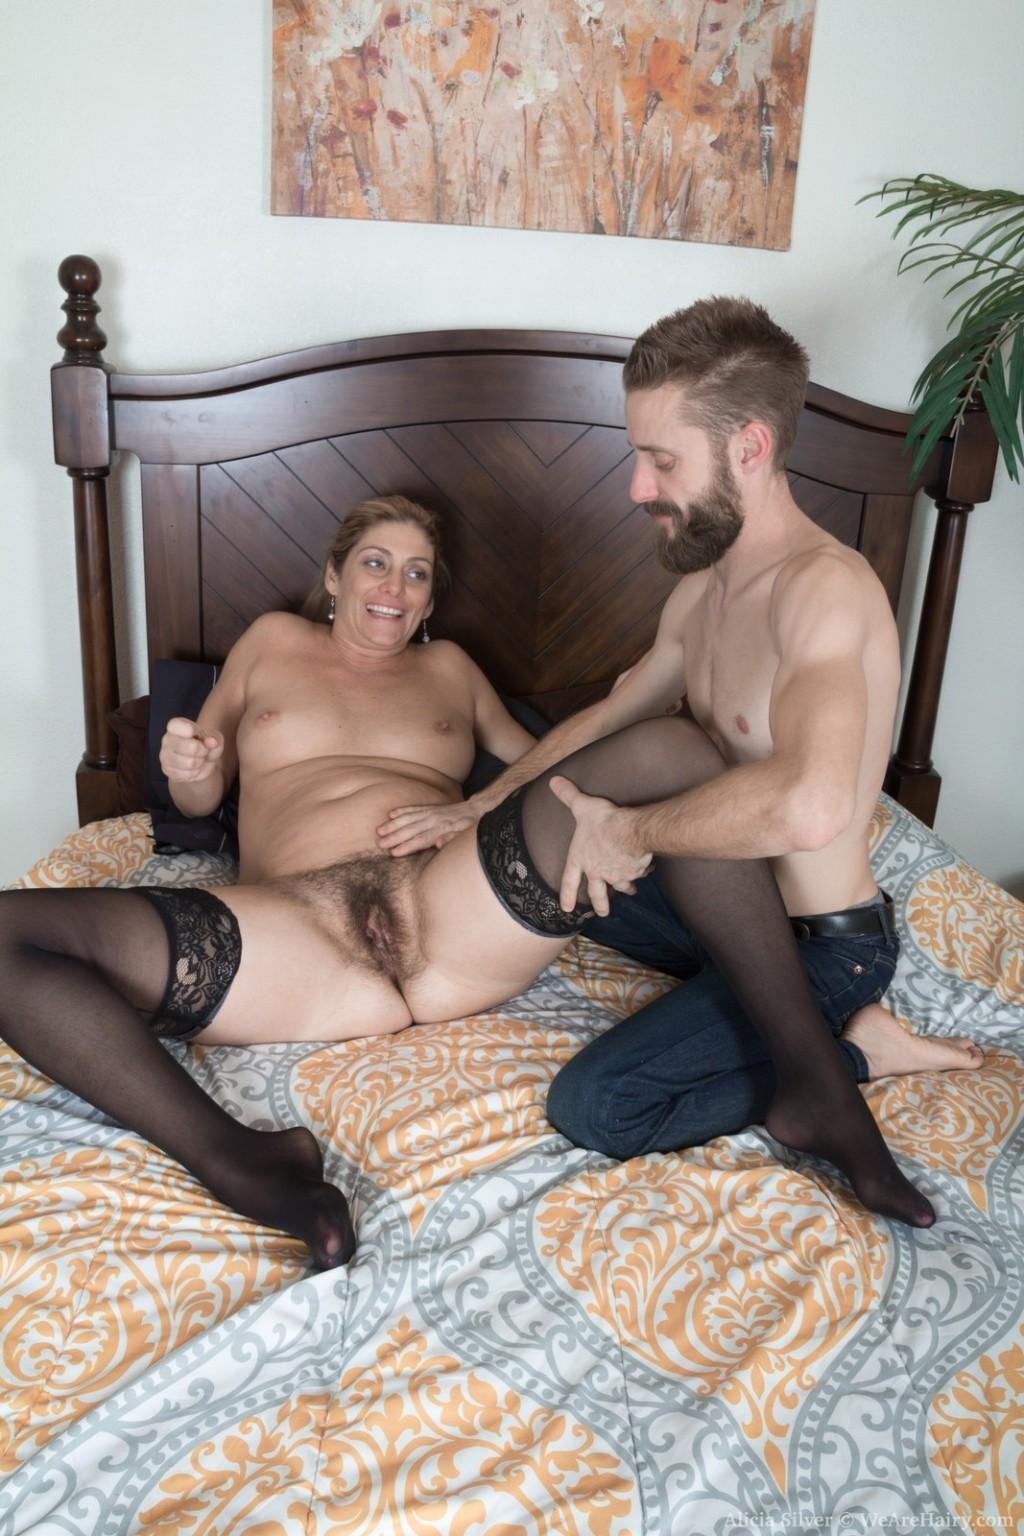 Hot hairy milf sex